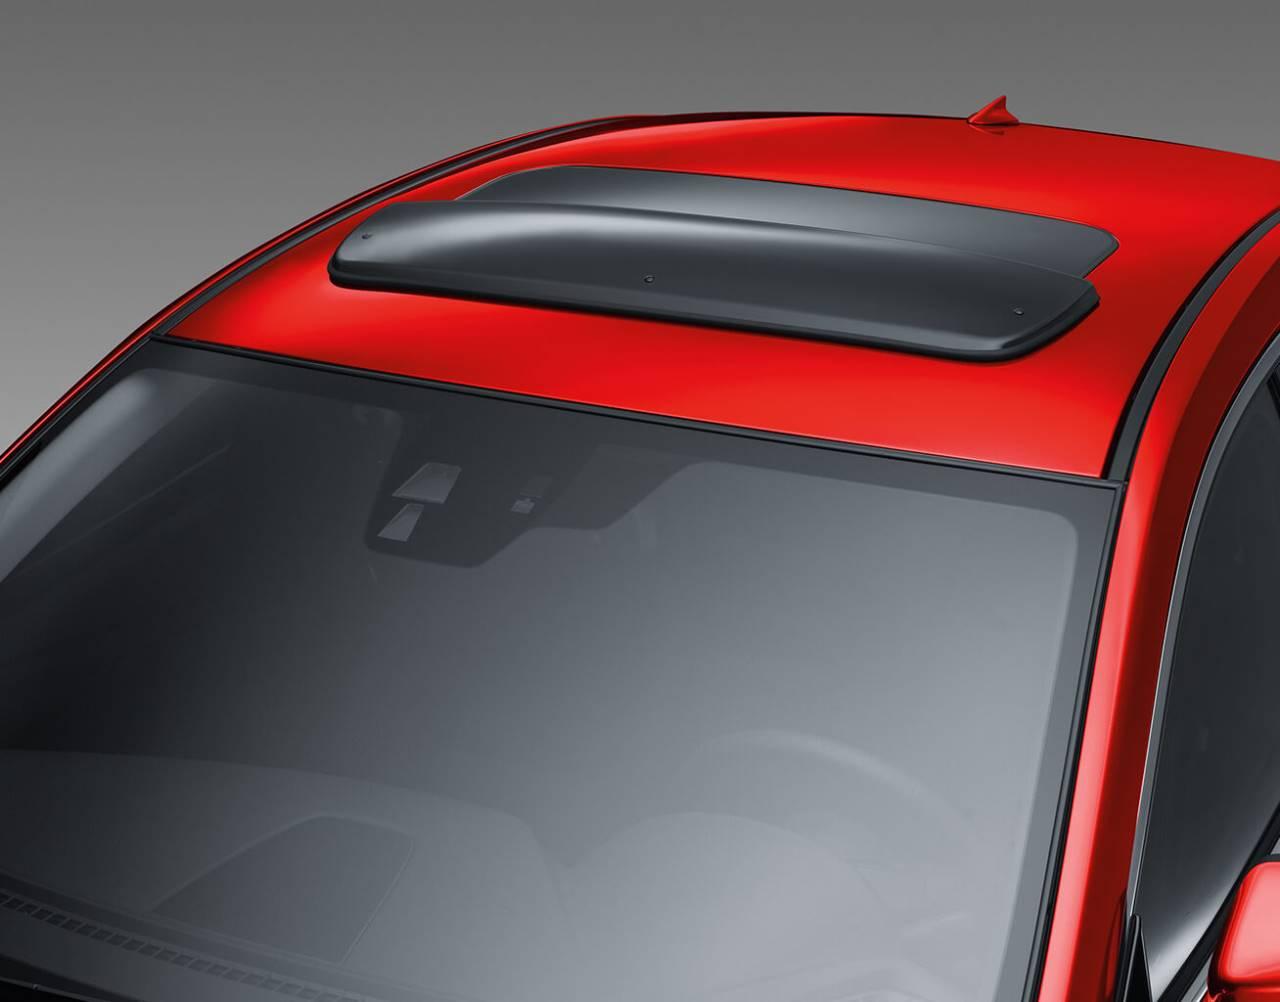 2018 Mazda6, MOONROOF WIND DEFLECTOR<sup>*</sup>